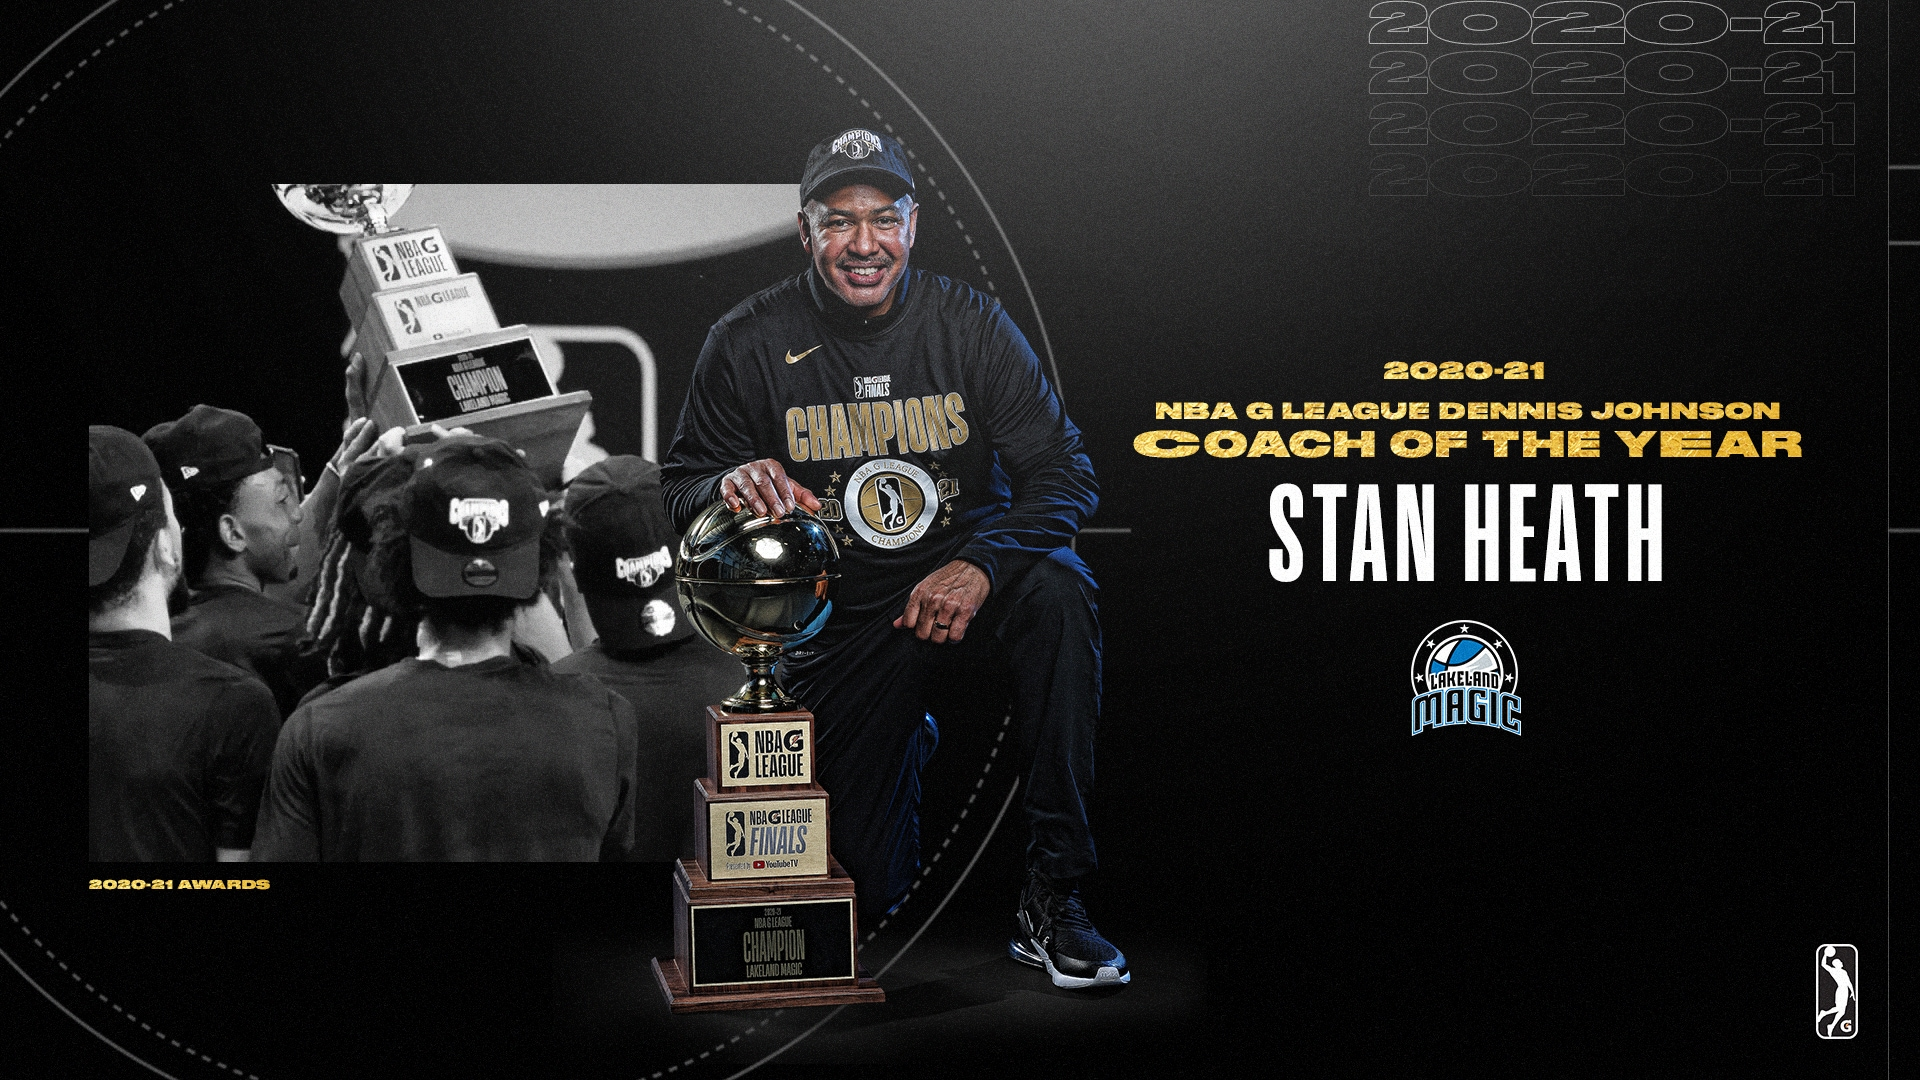 Stan Heath